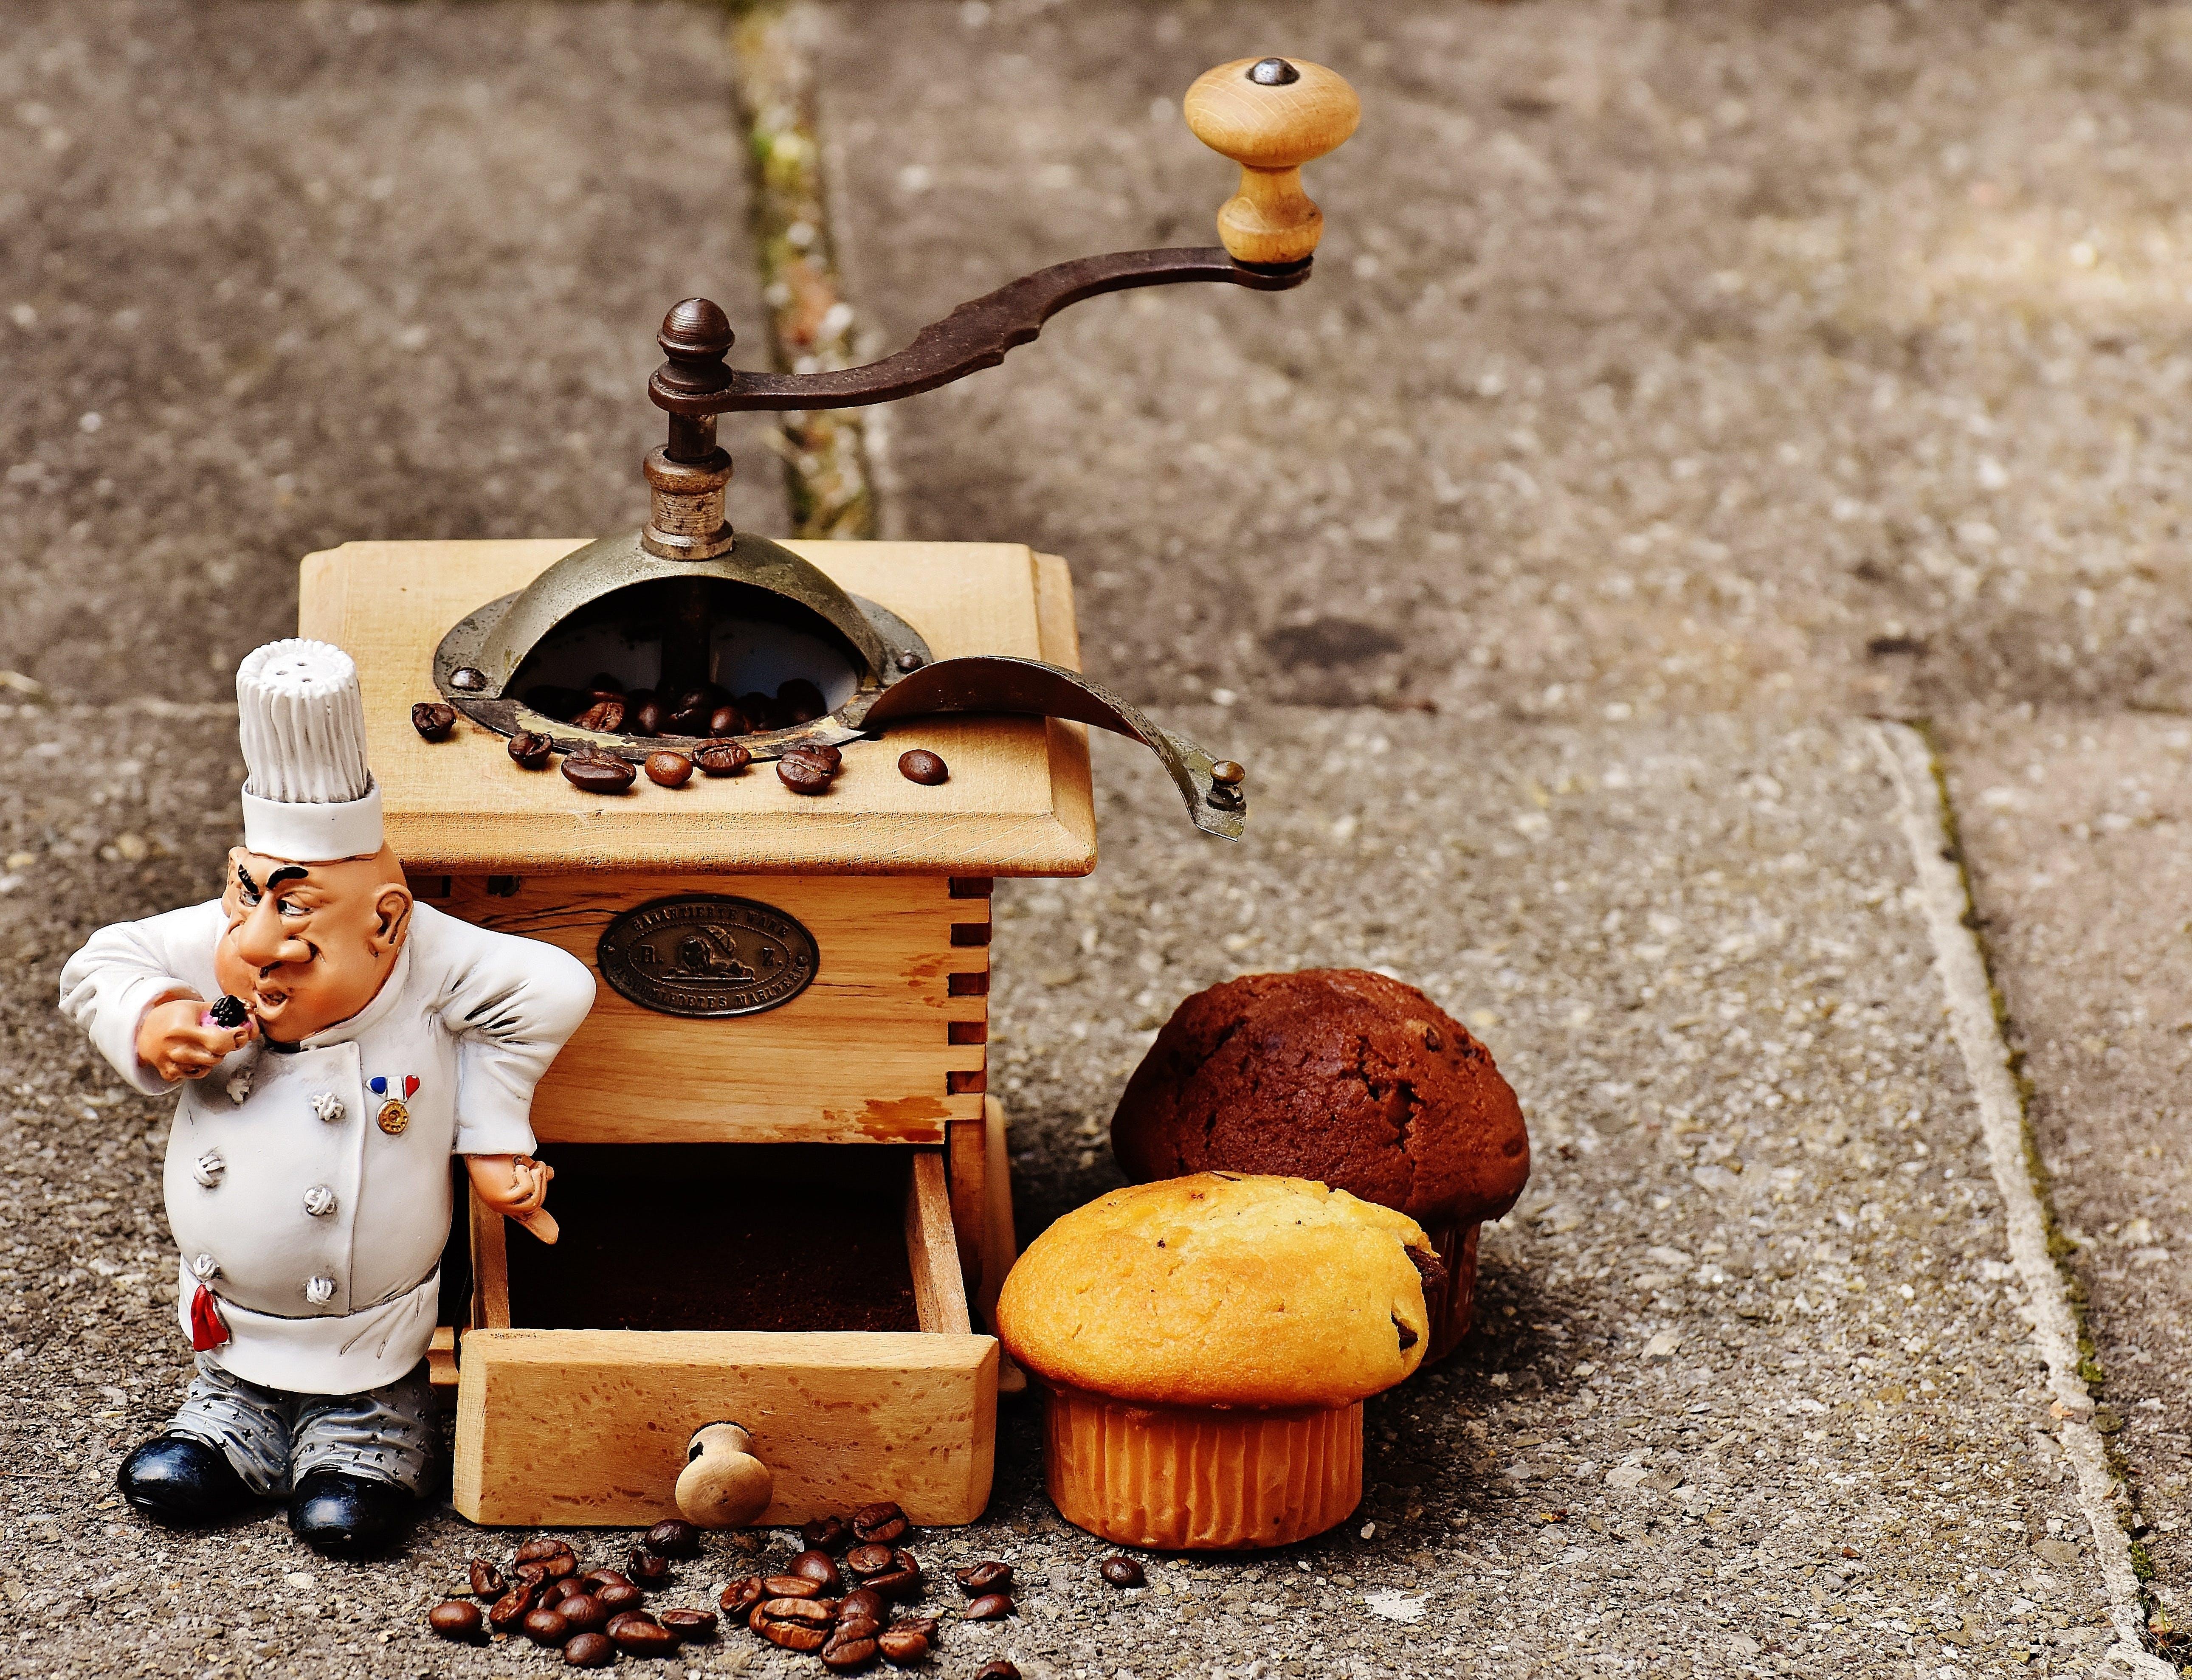 antique, bake, baker